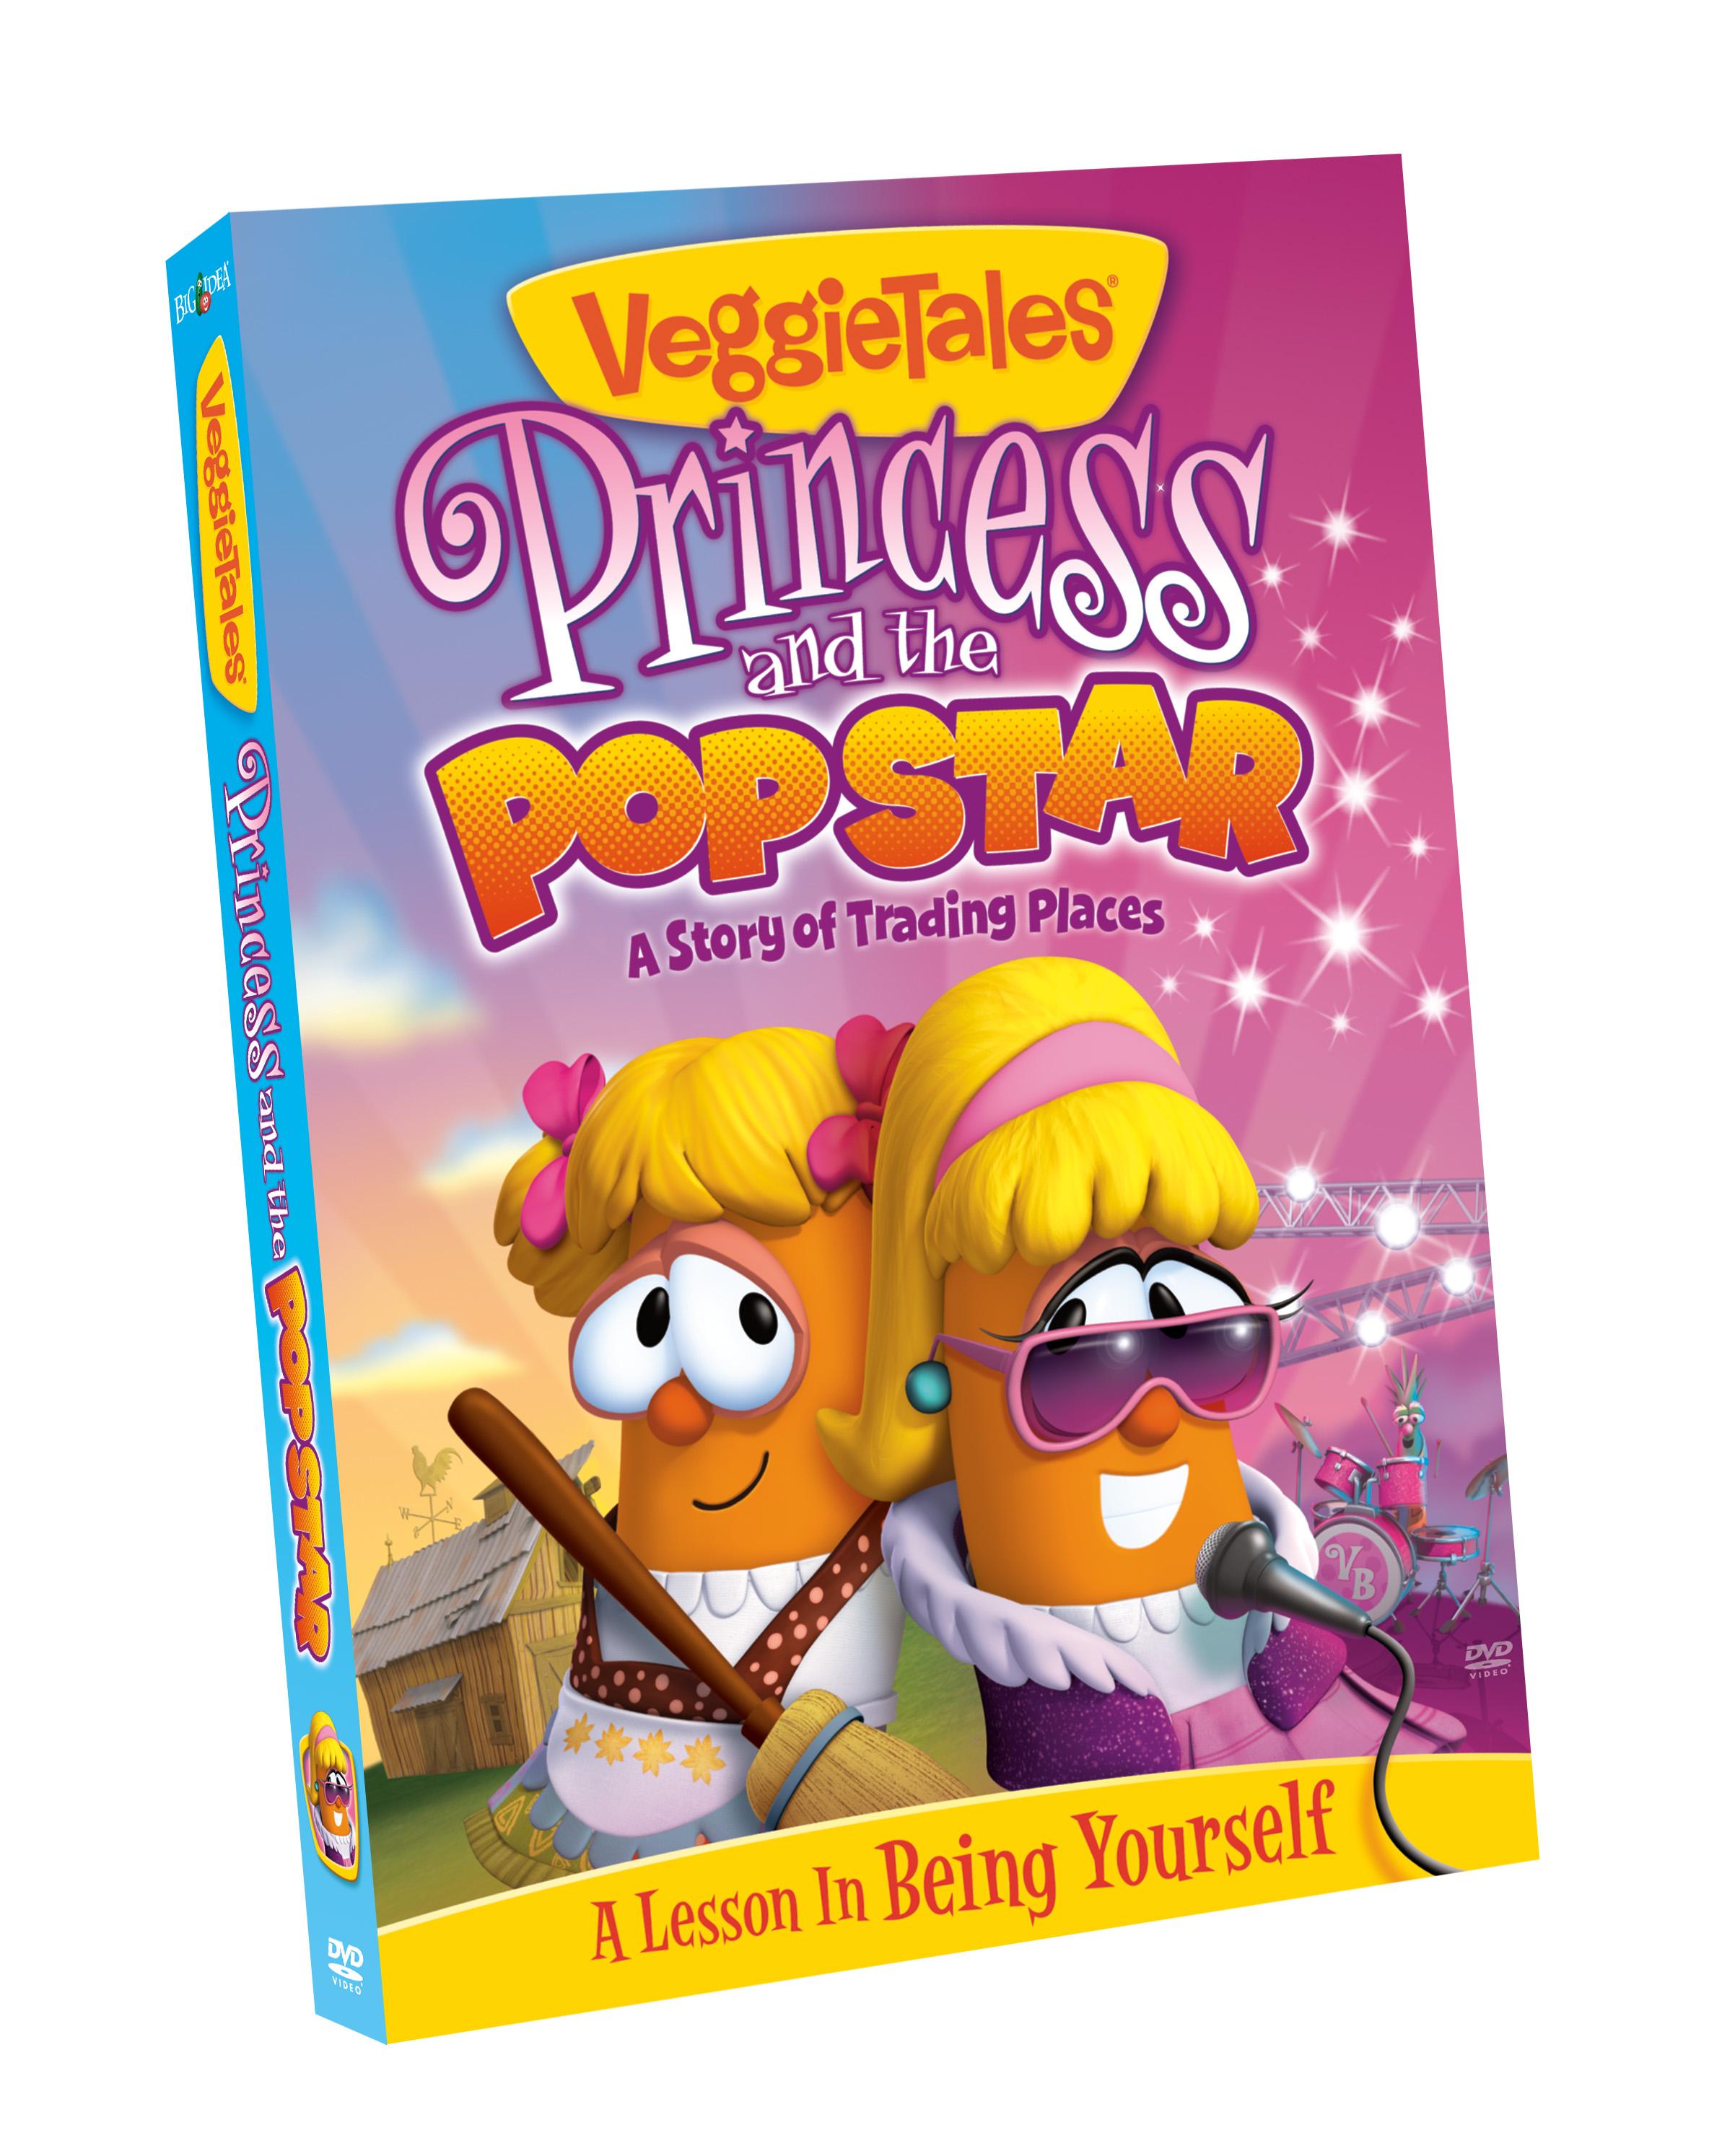 veggietales princess and popstar box art